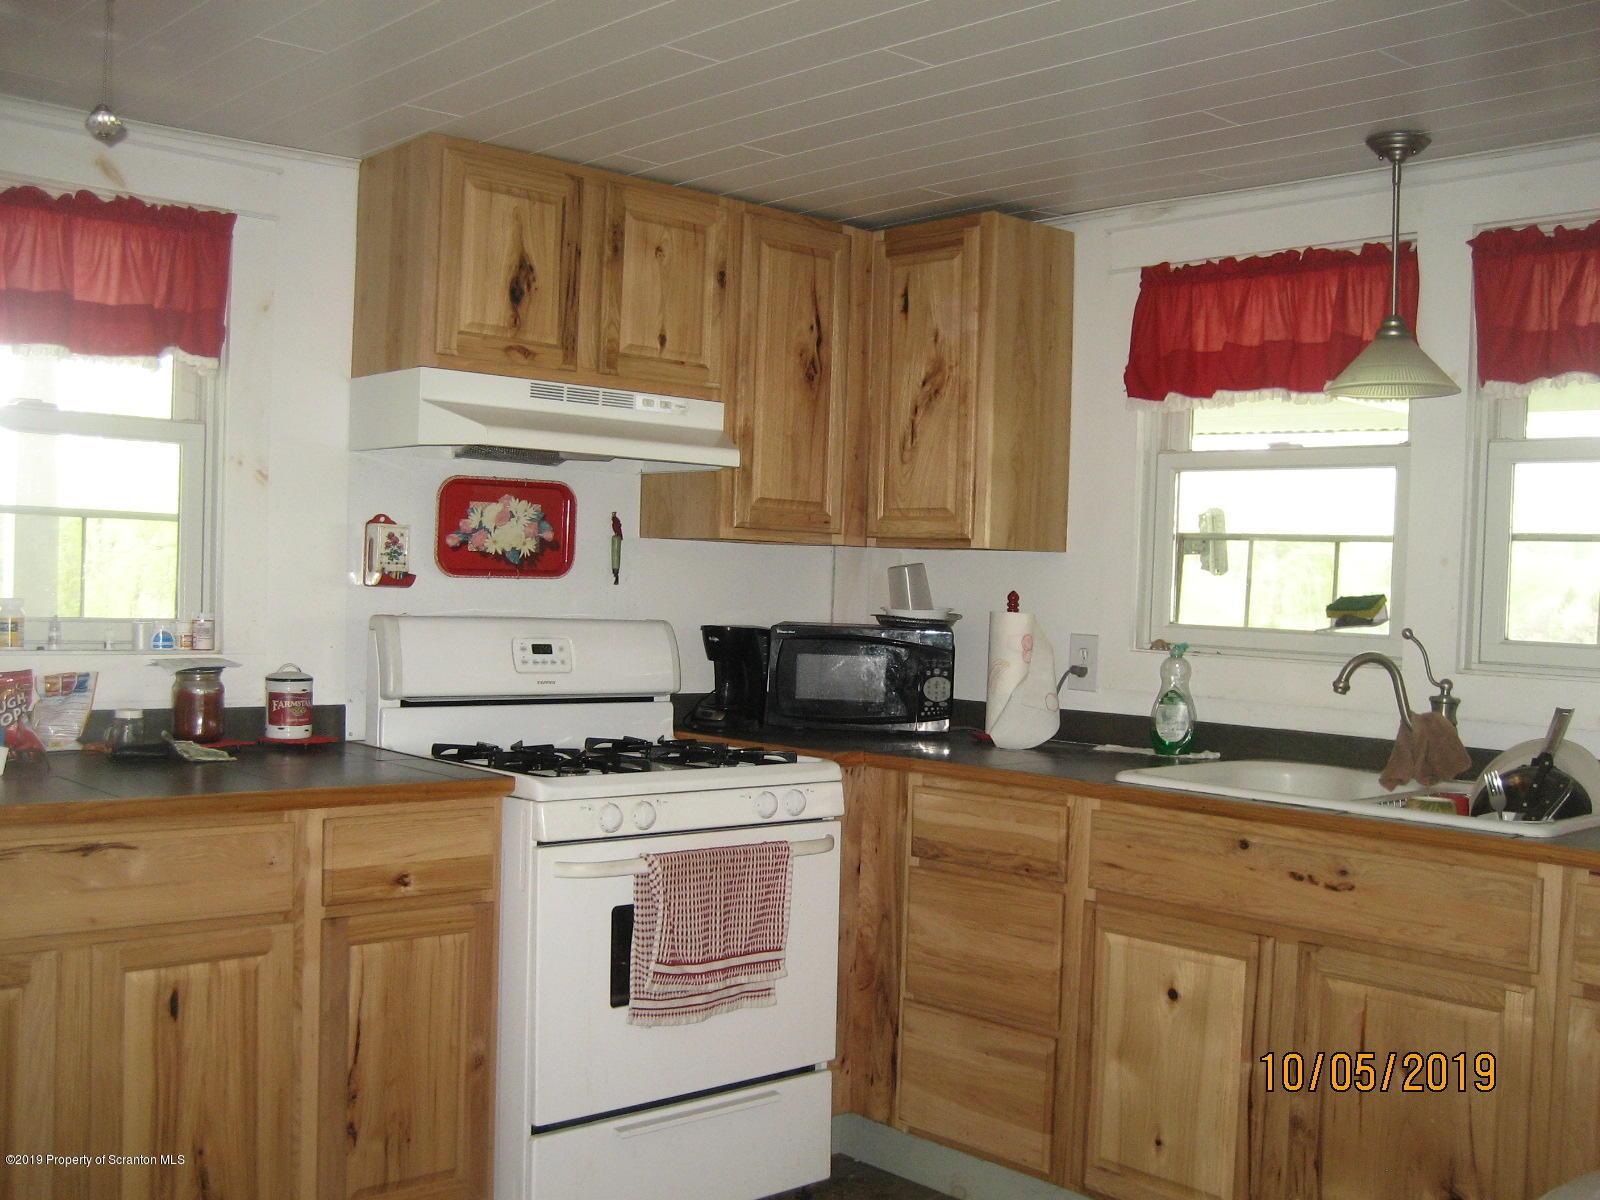 341 Sheldon street, Susquehanna, Pennsylvania 18847, 4 Bedrooms Bedrooms, 8 Rooms Rooms,2 BathroomsBathrooms,Single Family,For Sale,Sheldon,19-2174